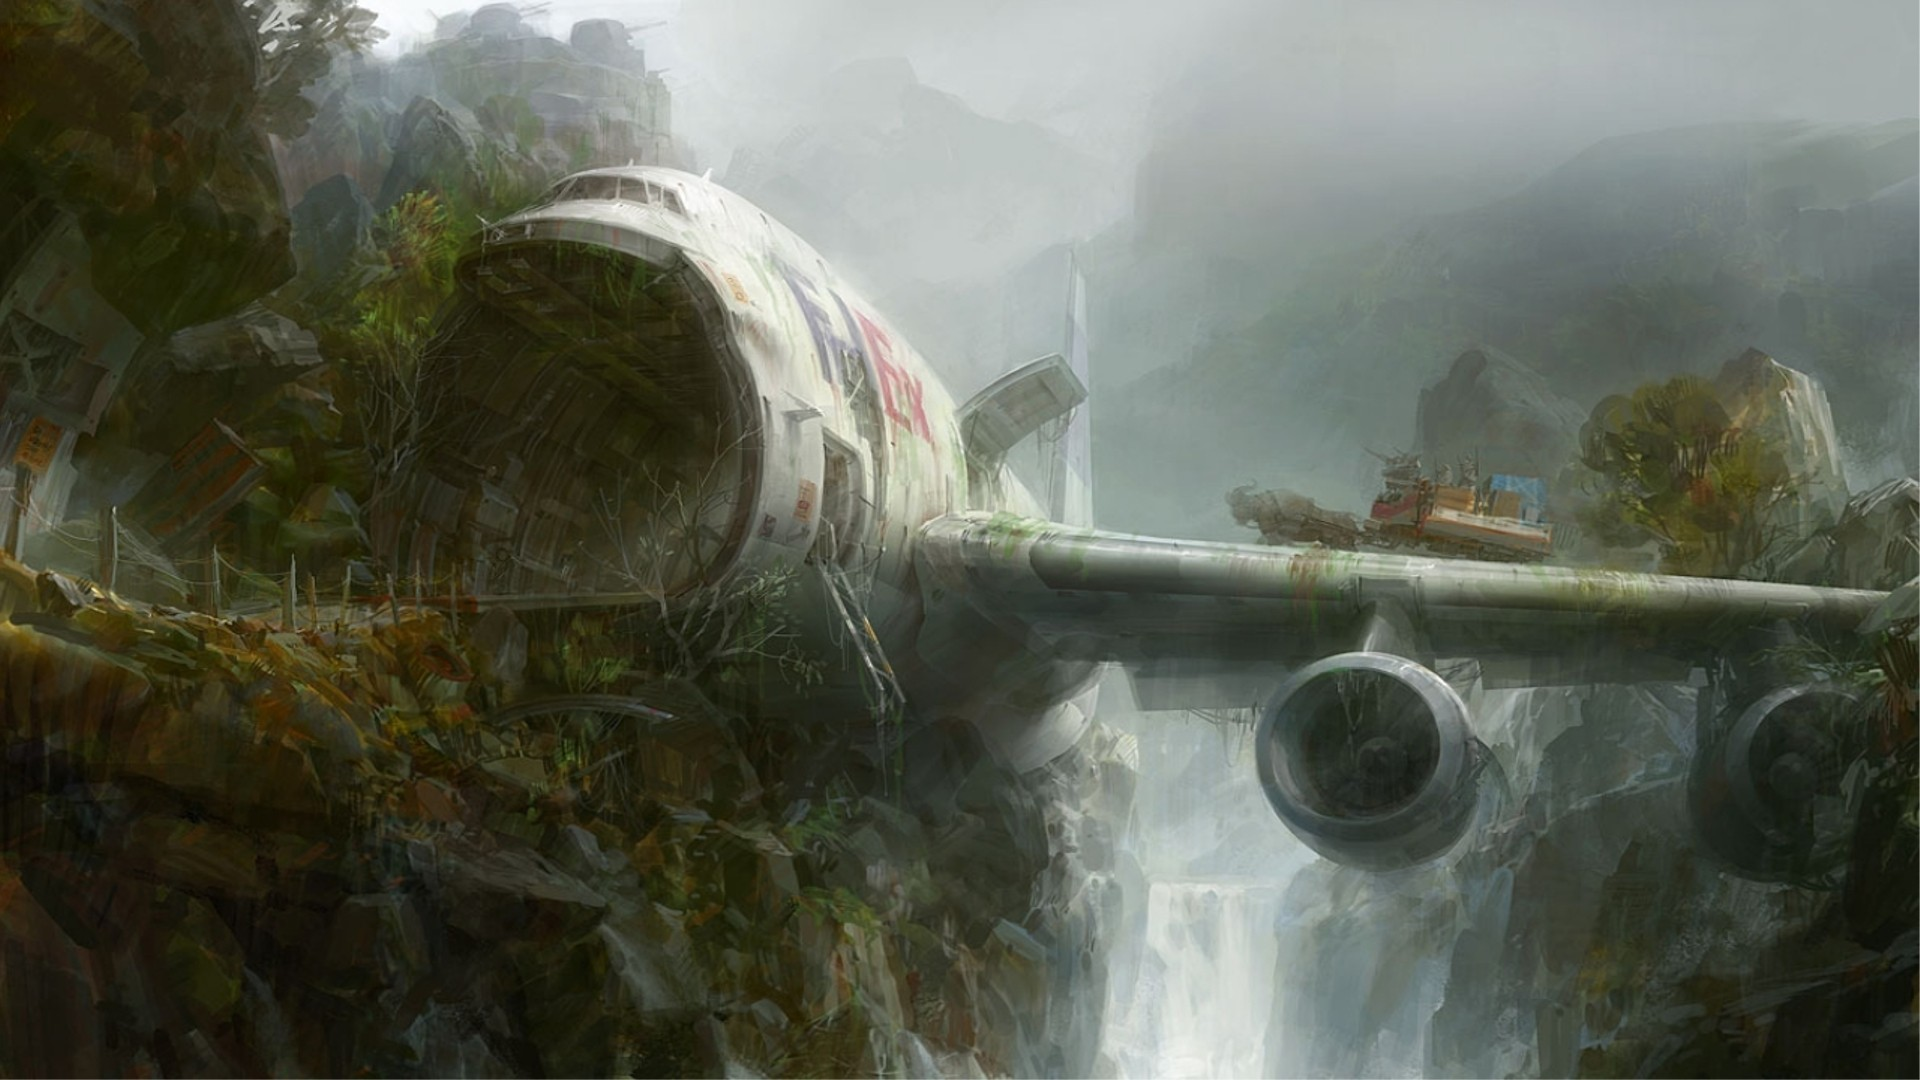 General 1920x1080 dystopian Fedex airplane crash fantasy art aircraft wreck artwork